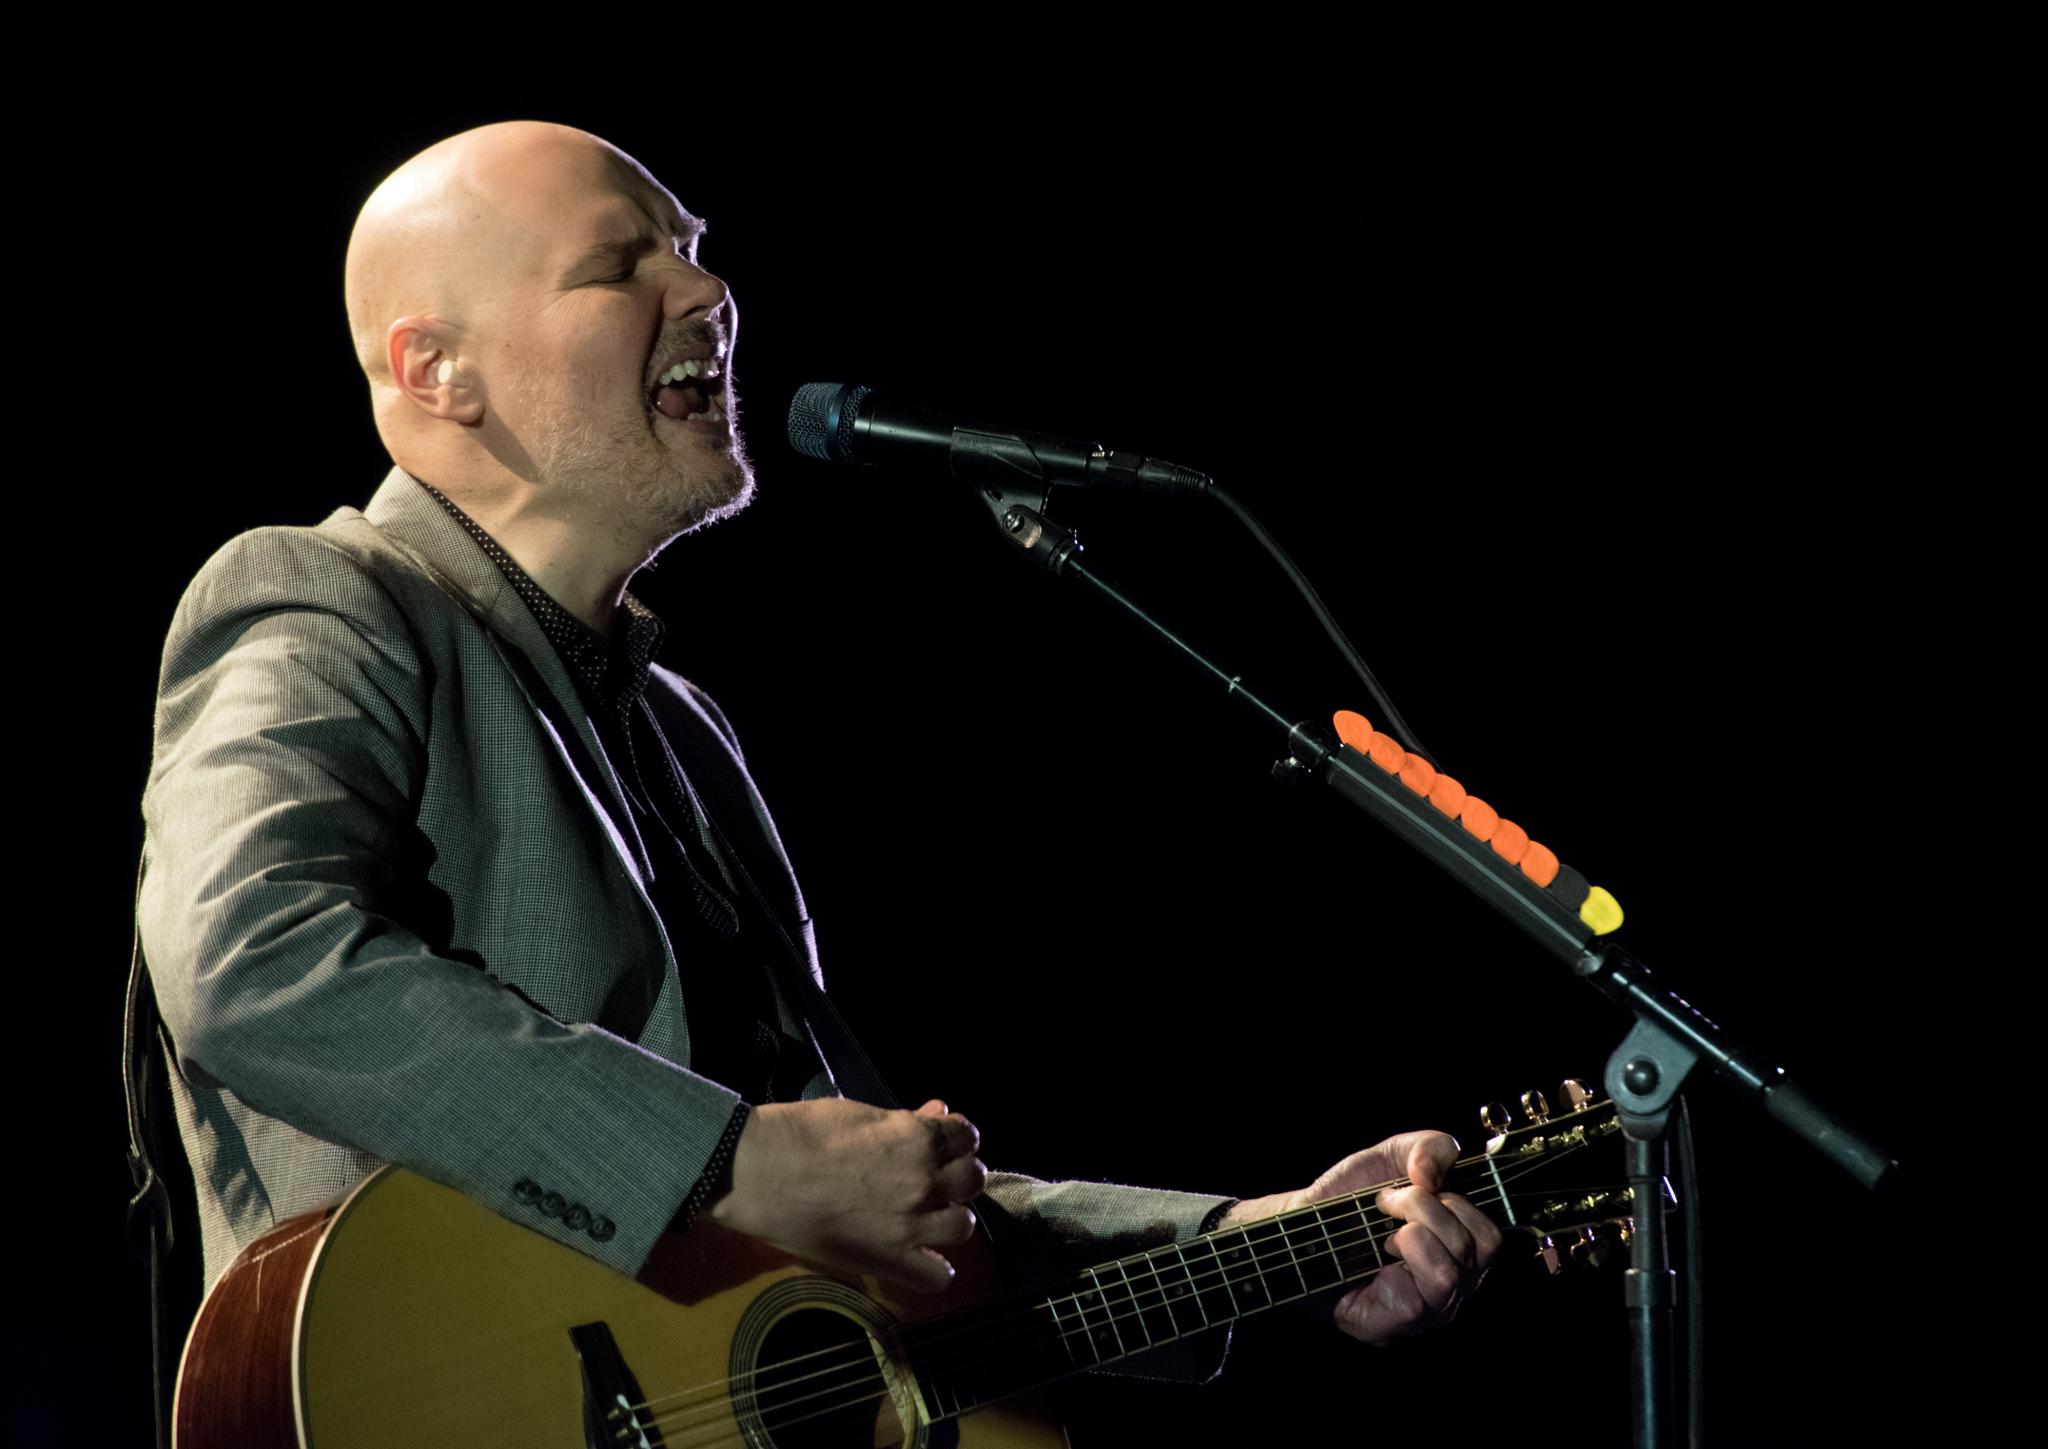 Billy Corgan Treats Fans at Intimate Shows